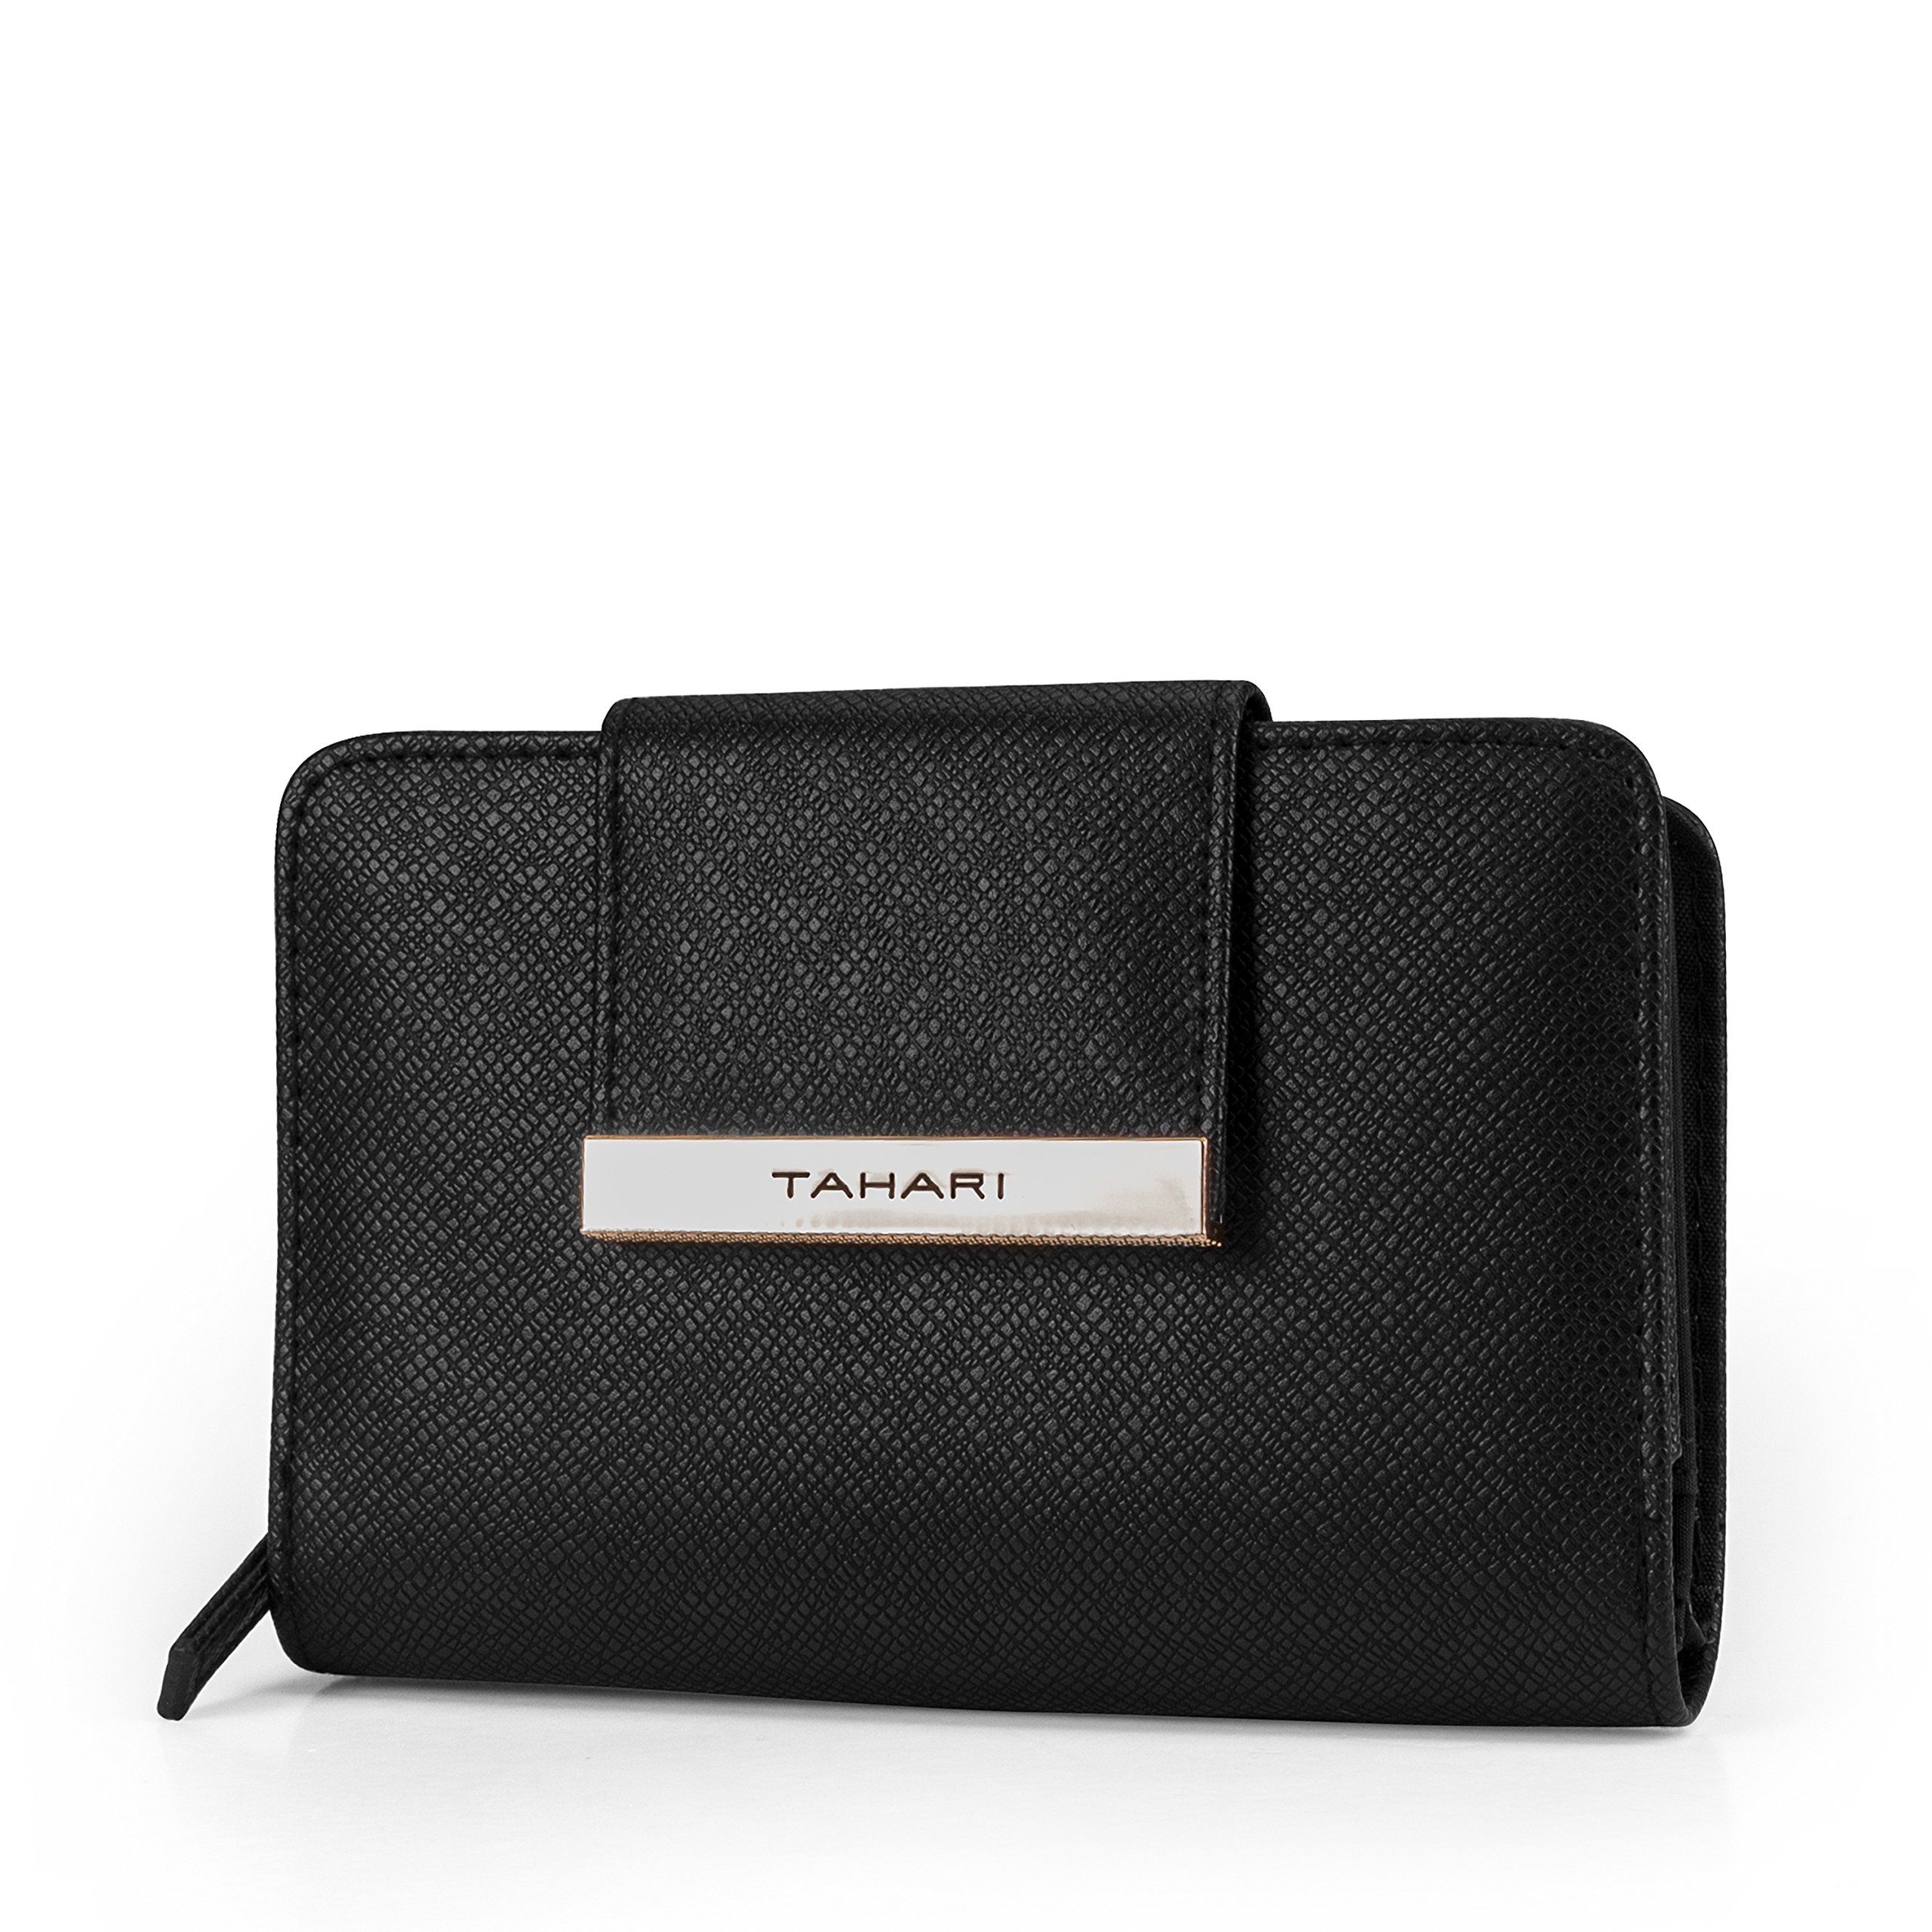 Tahari Hold on Small Womens Wallet RFID Blocking Compact Clutch Organizer Vegan Leather (Black)